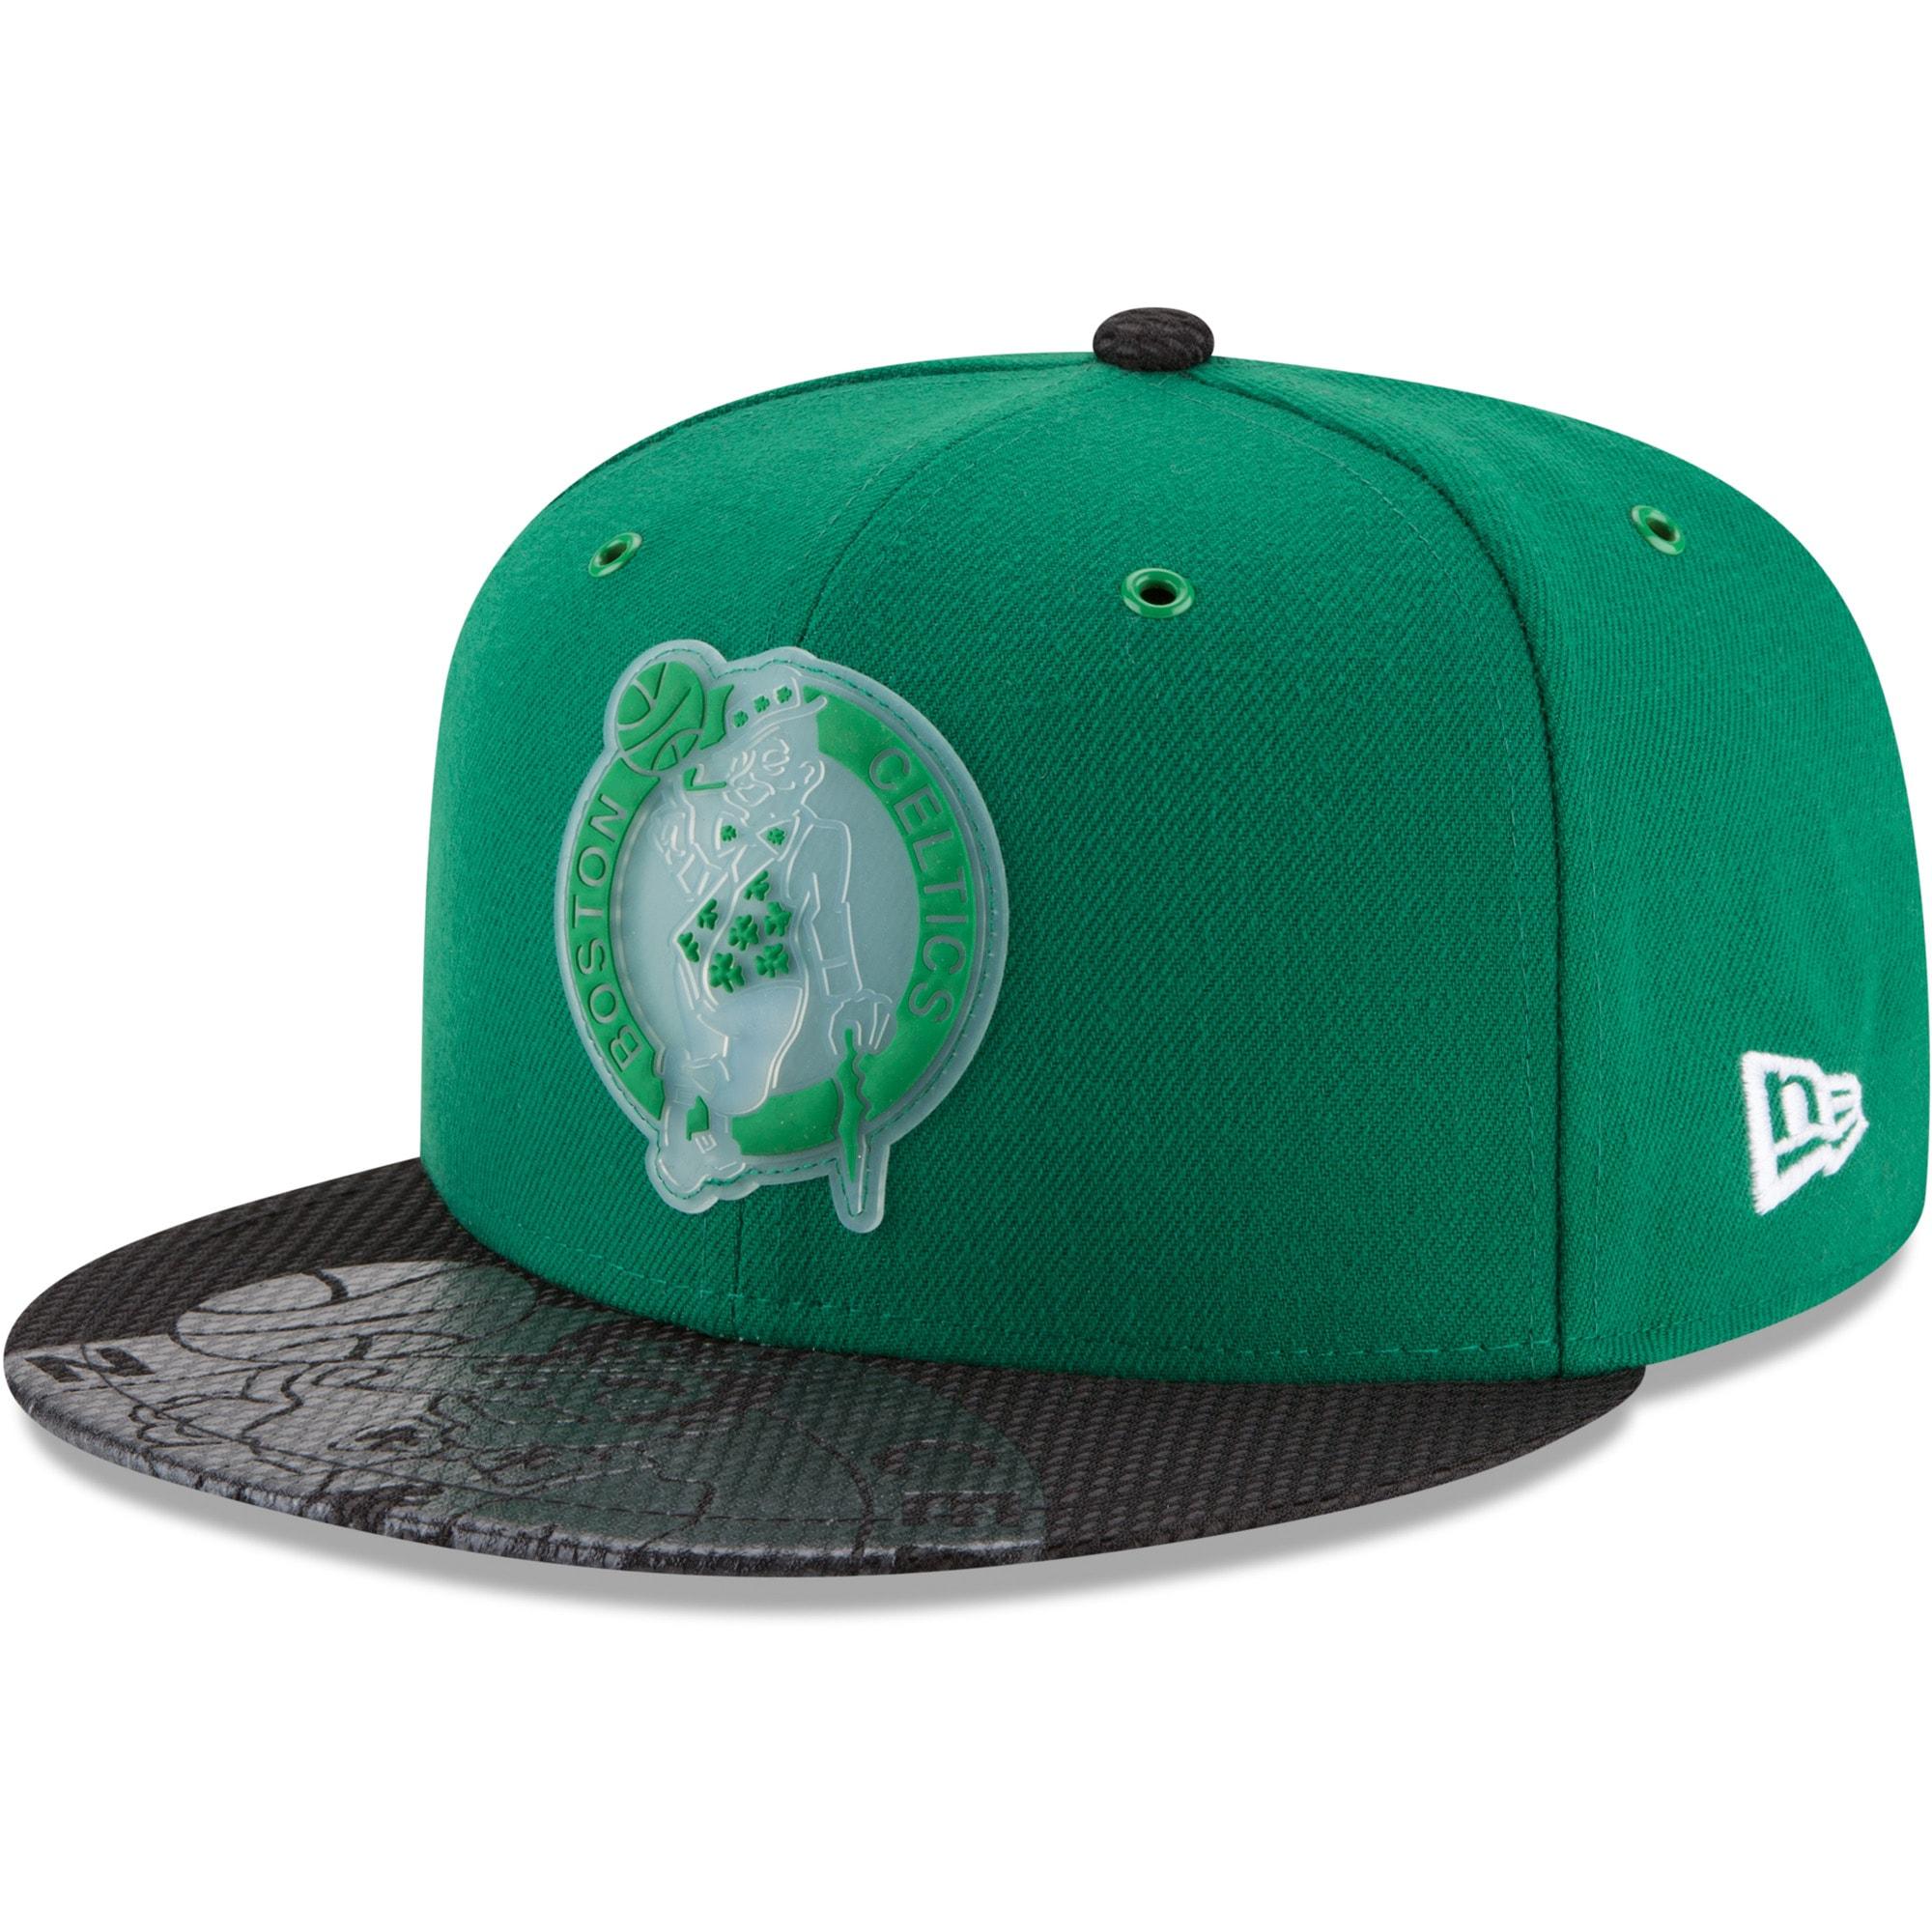 Boston Celtics New Era Team Color On-Court 9FIFTY Snapback Adjustable Hat - Kelly Green